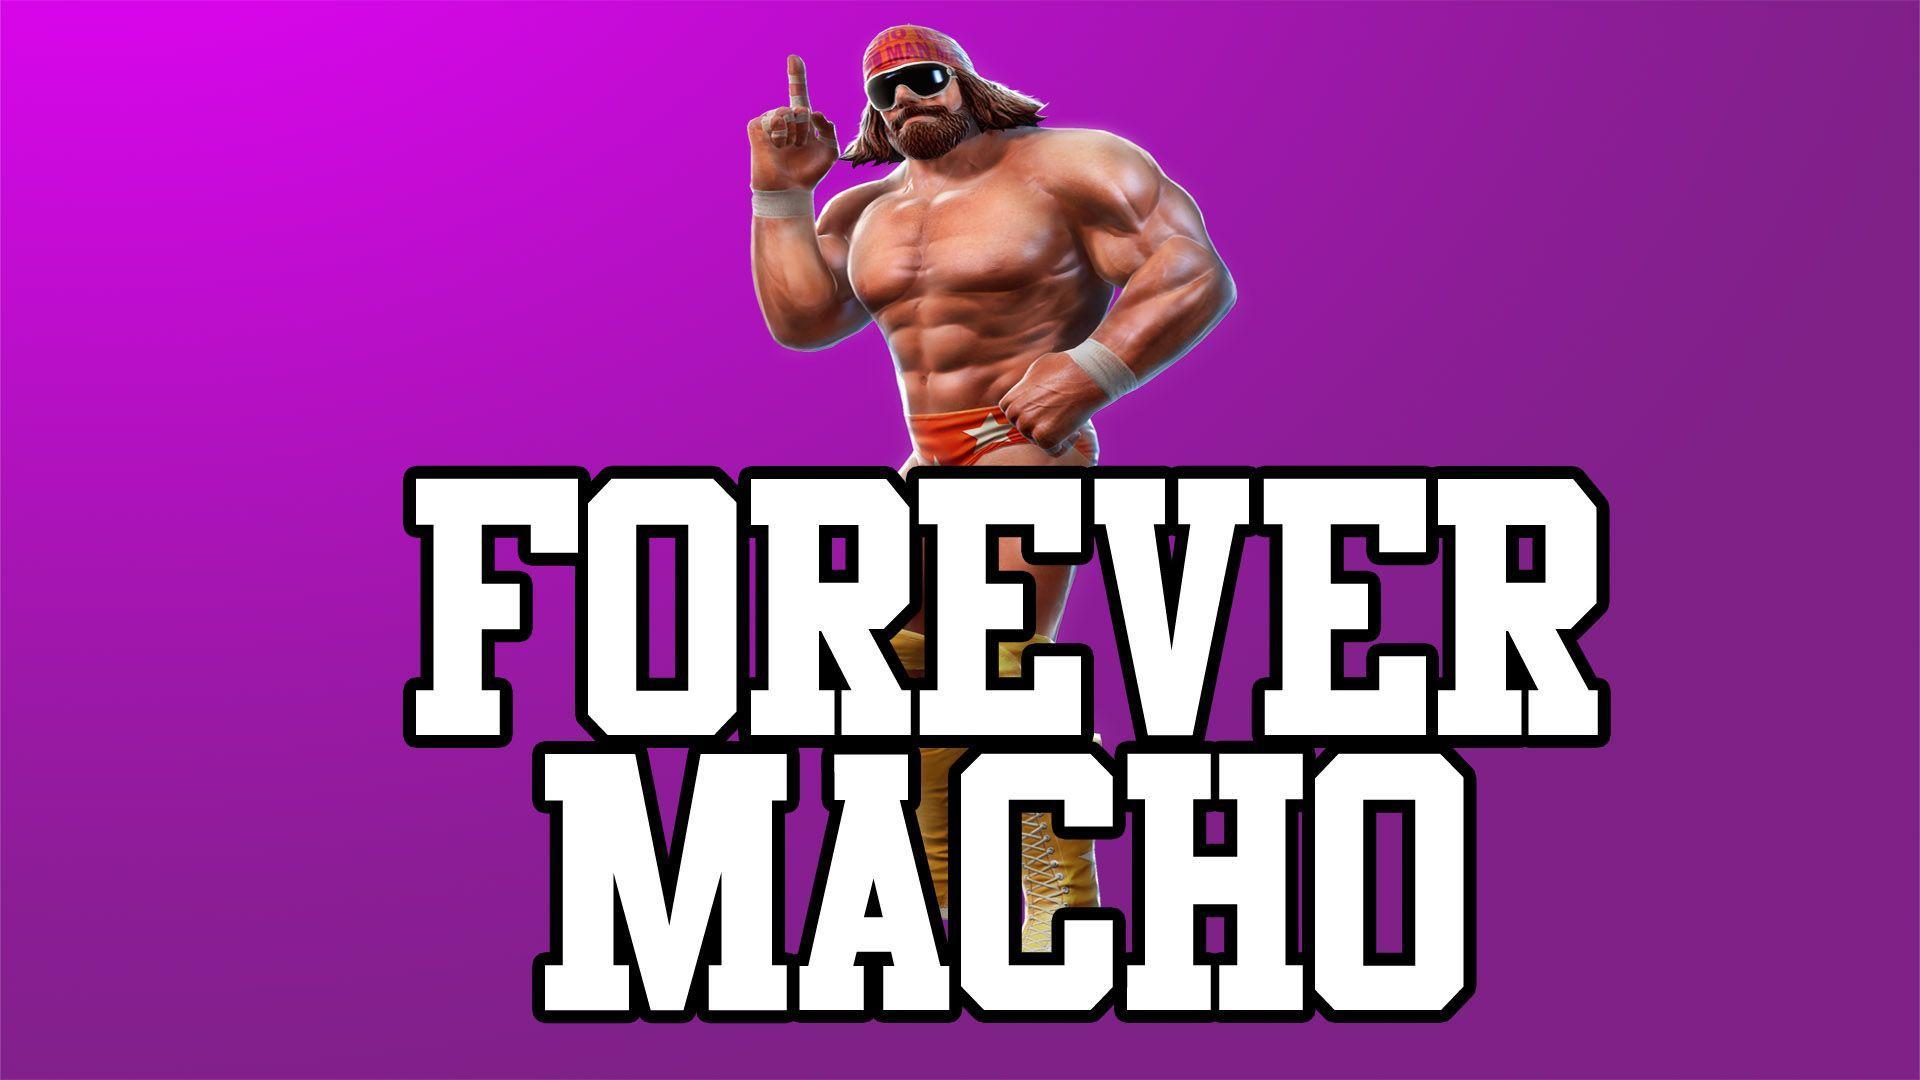 macho man randy savage hd wallpaper